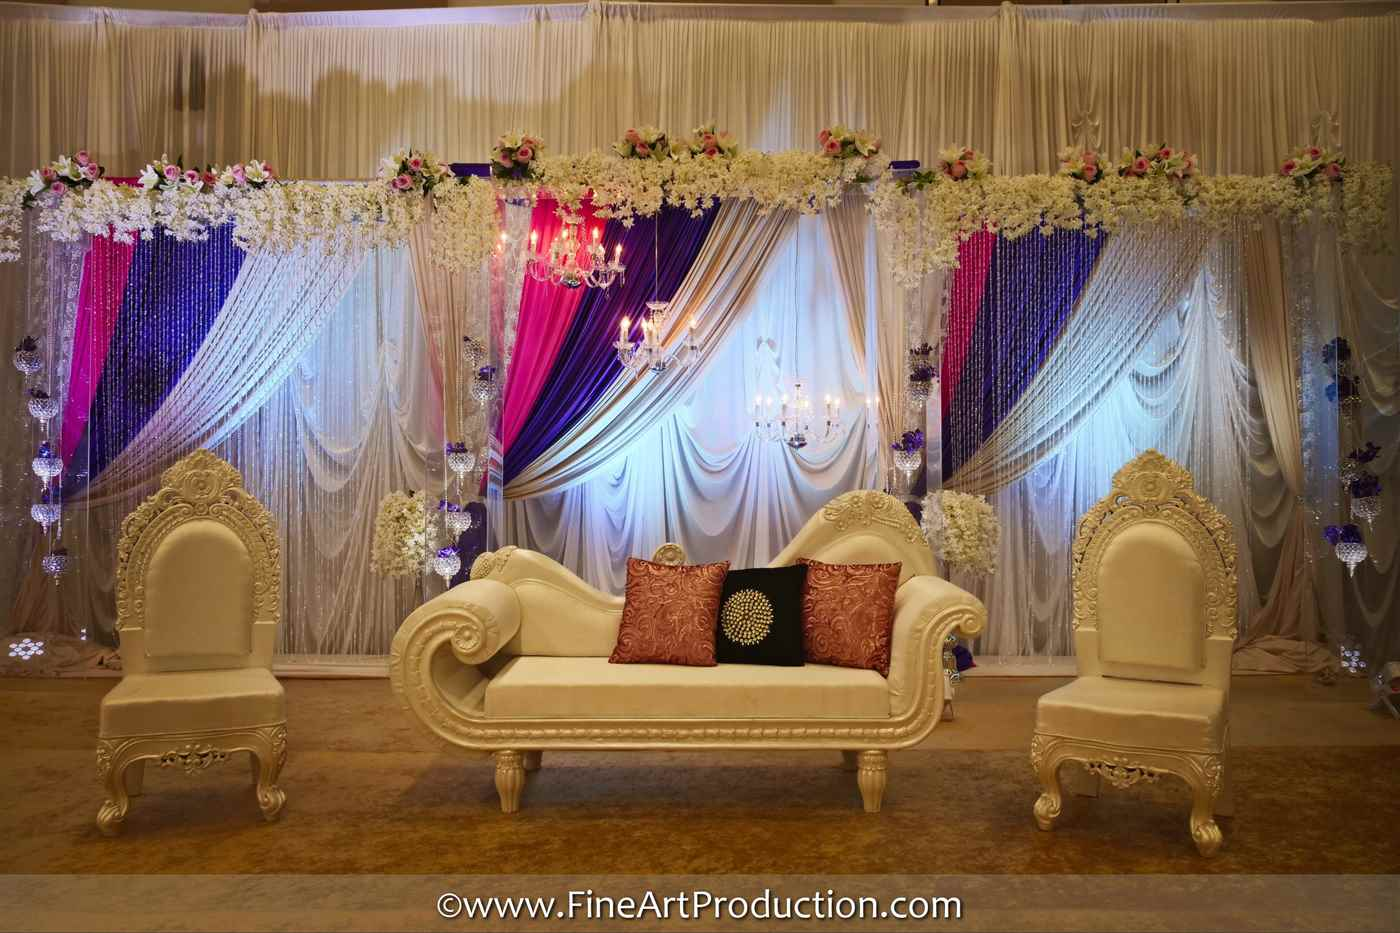 Wedding Photos and Video